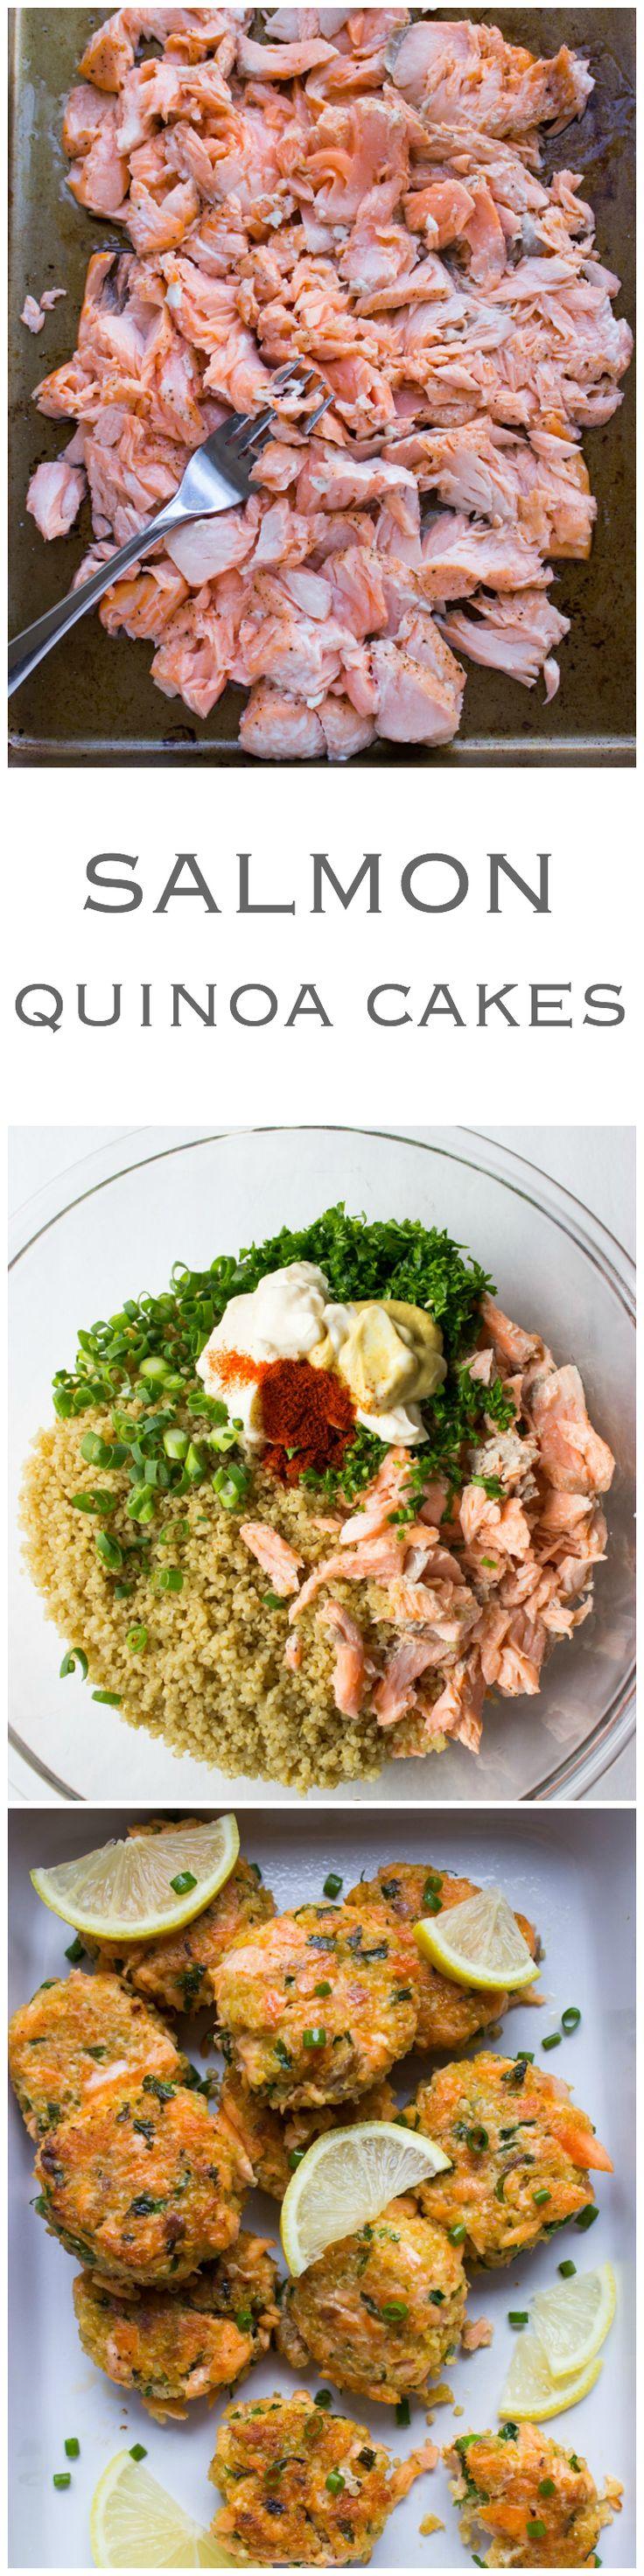 Salmon Quinoa Cakes – transform leftover salmon into these delicious super moist and tender cakes. Pinterest: @Annah | Pyra